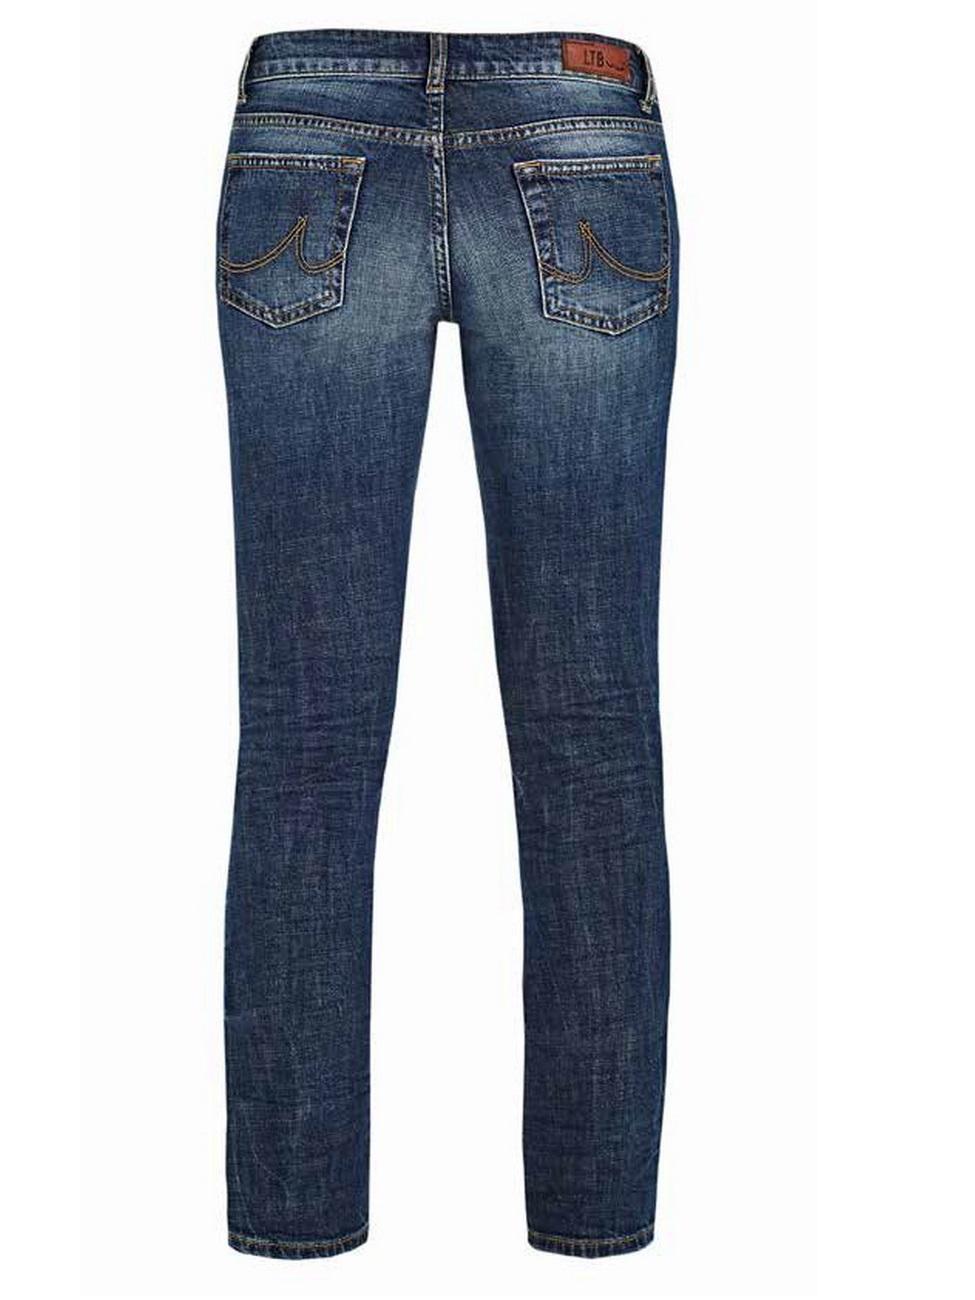 ltb damen jeans aspen regular slim straight blau lasson wash kaufen jeans direct de. Black Bedroom Furniture Sets. Home Design Ideas